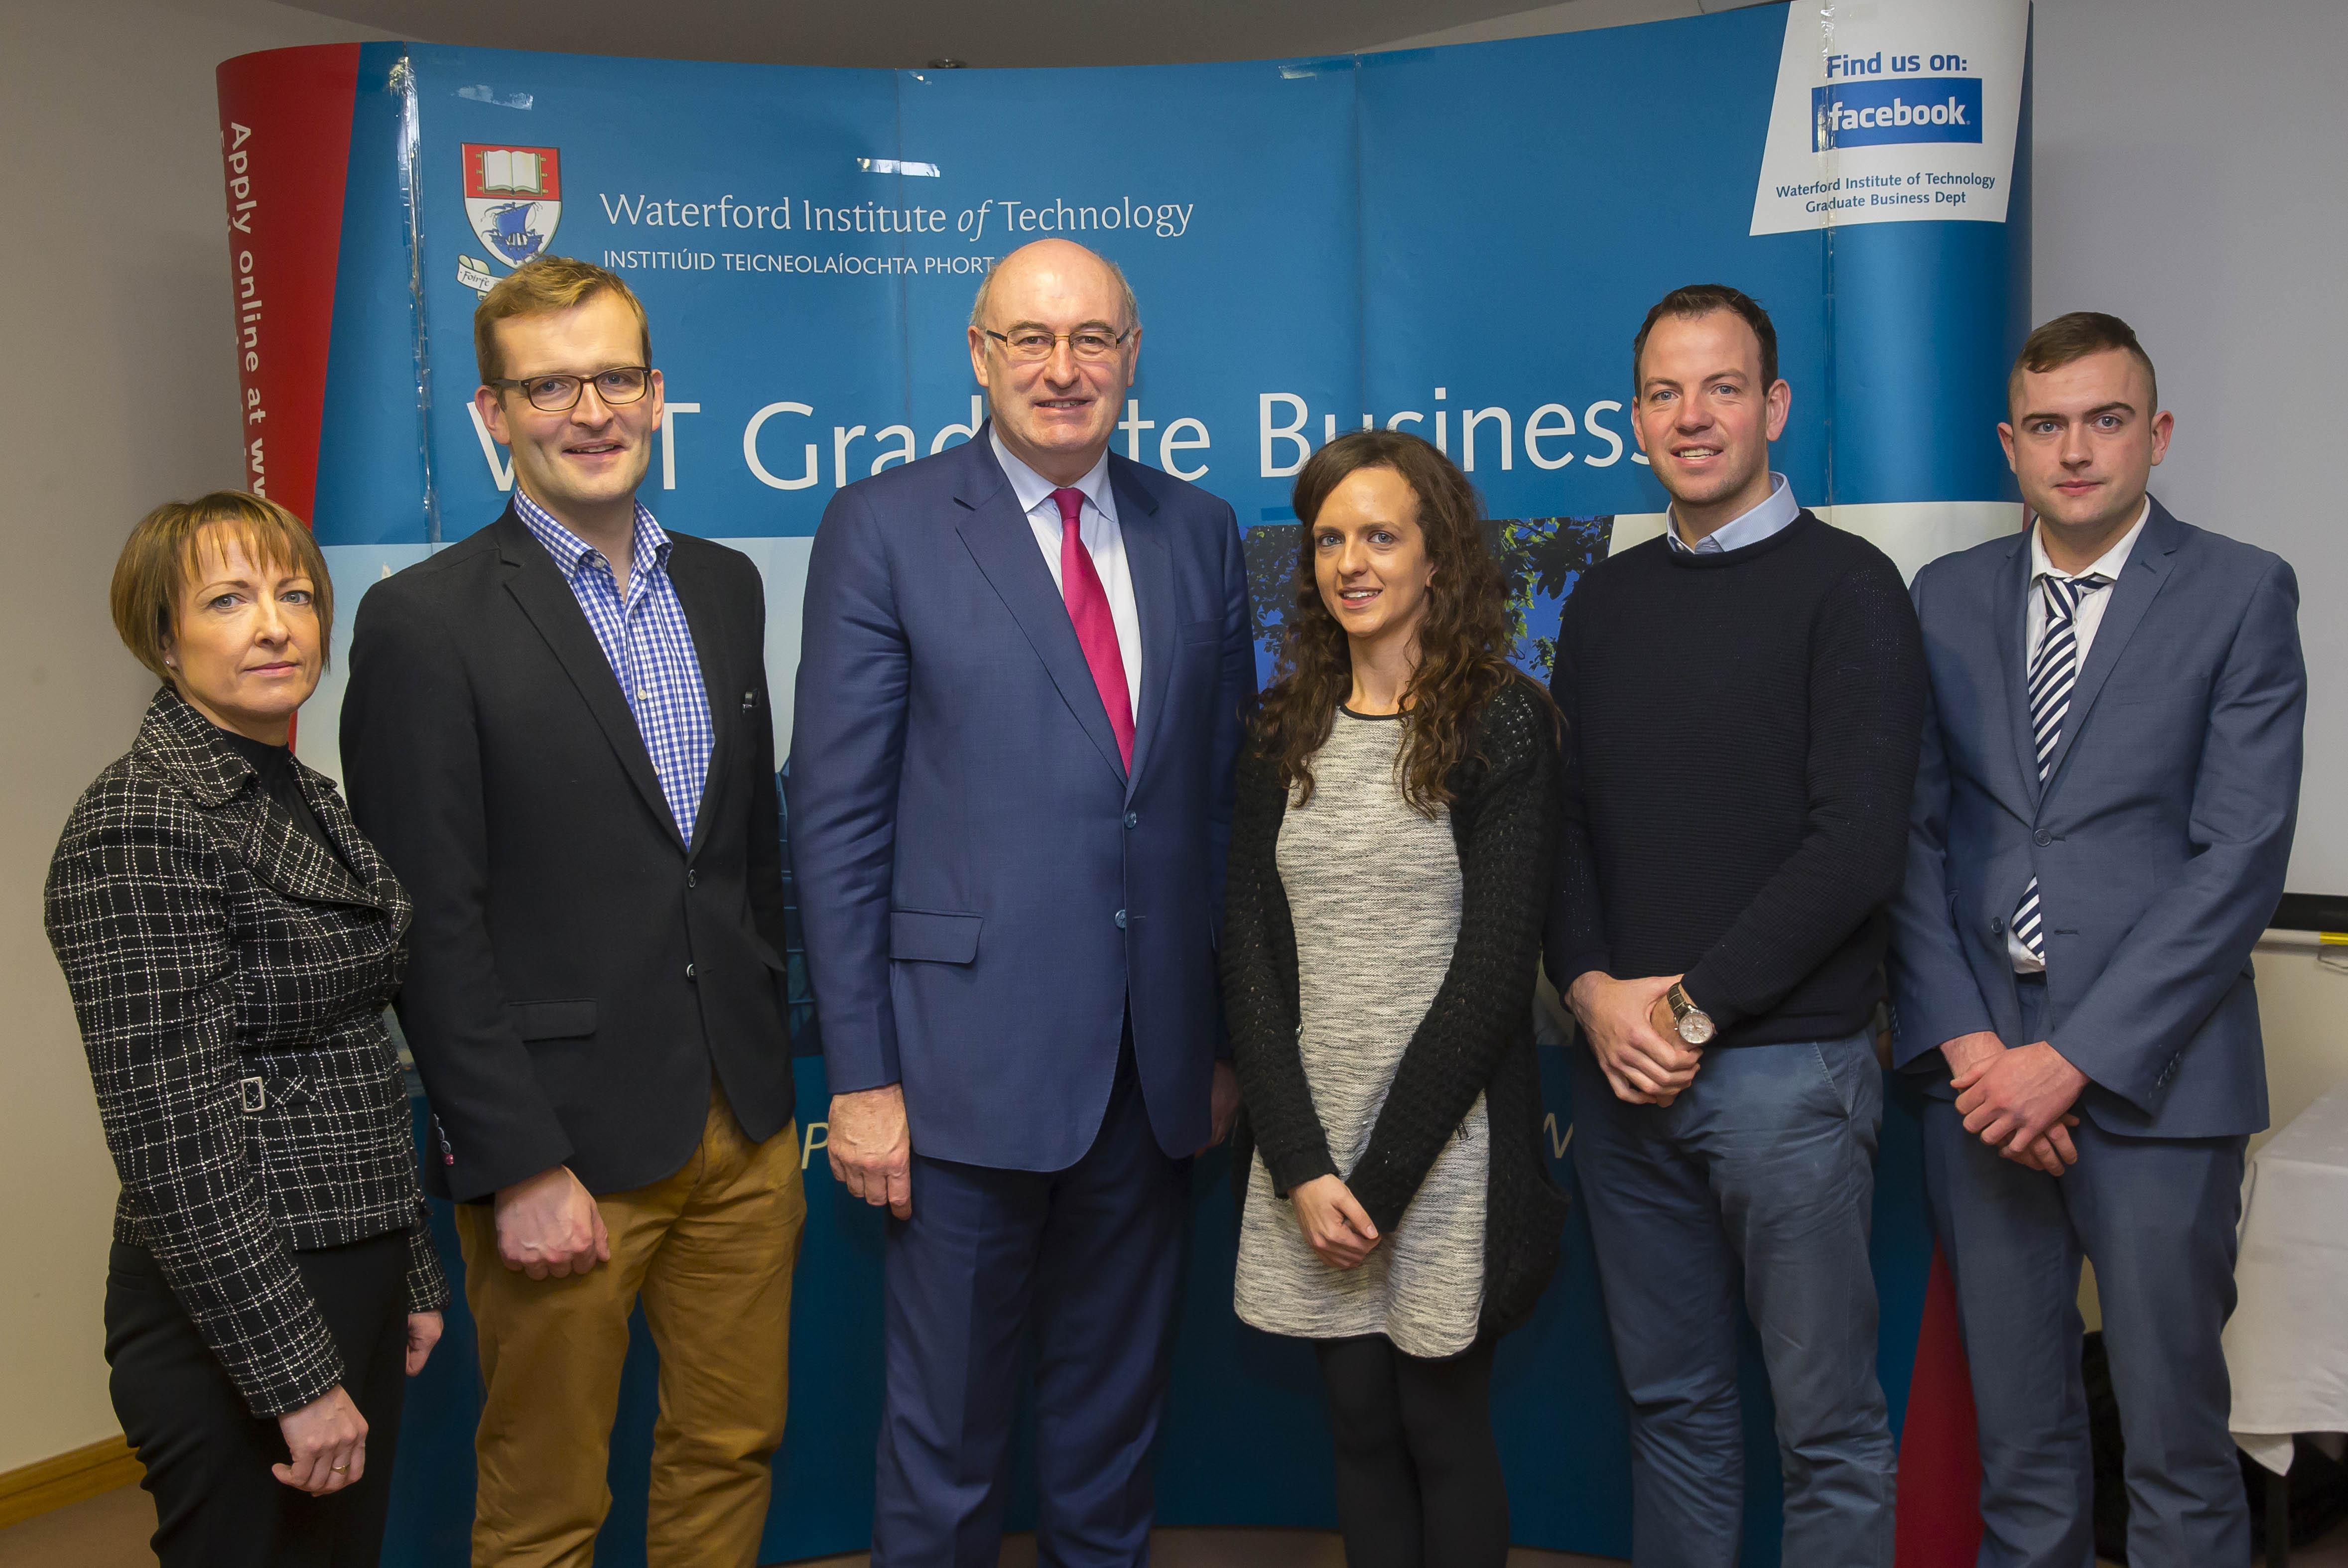 From left to right: Johanna Kavanagh,MBSI; John Paul Phelan, Commissioner Hogan, Ashling Kenny MBS, Conor Phelan MBS and Darren Healy, MBS